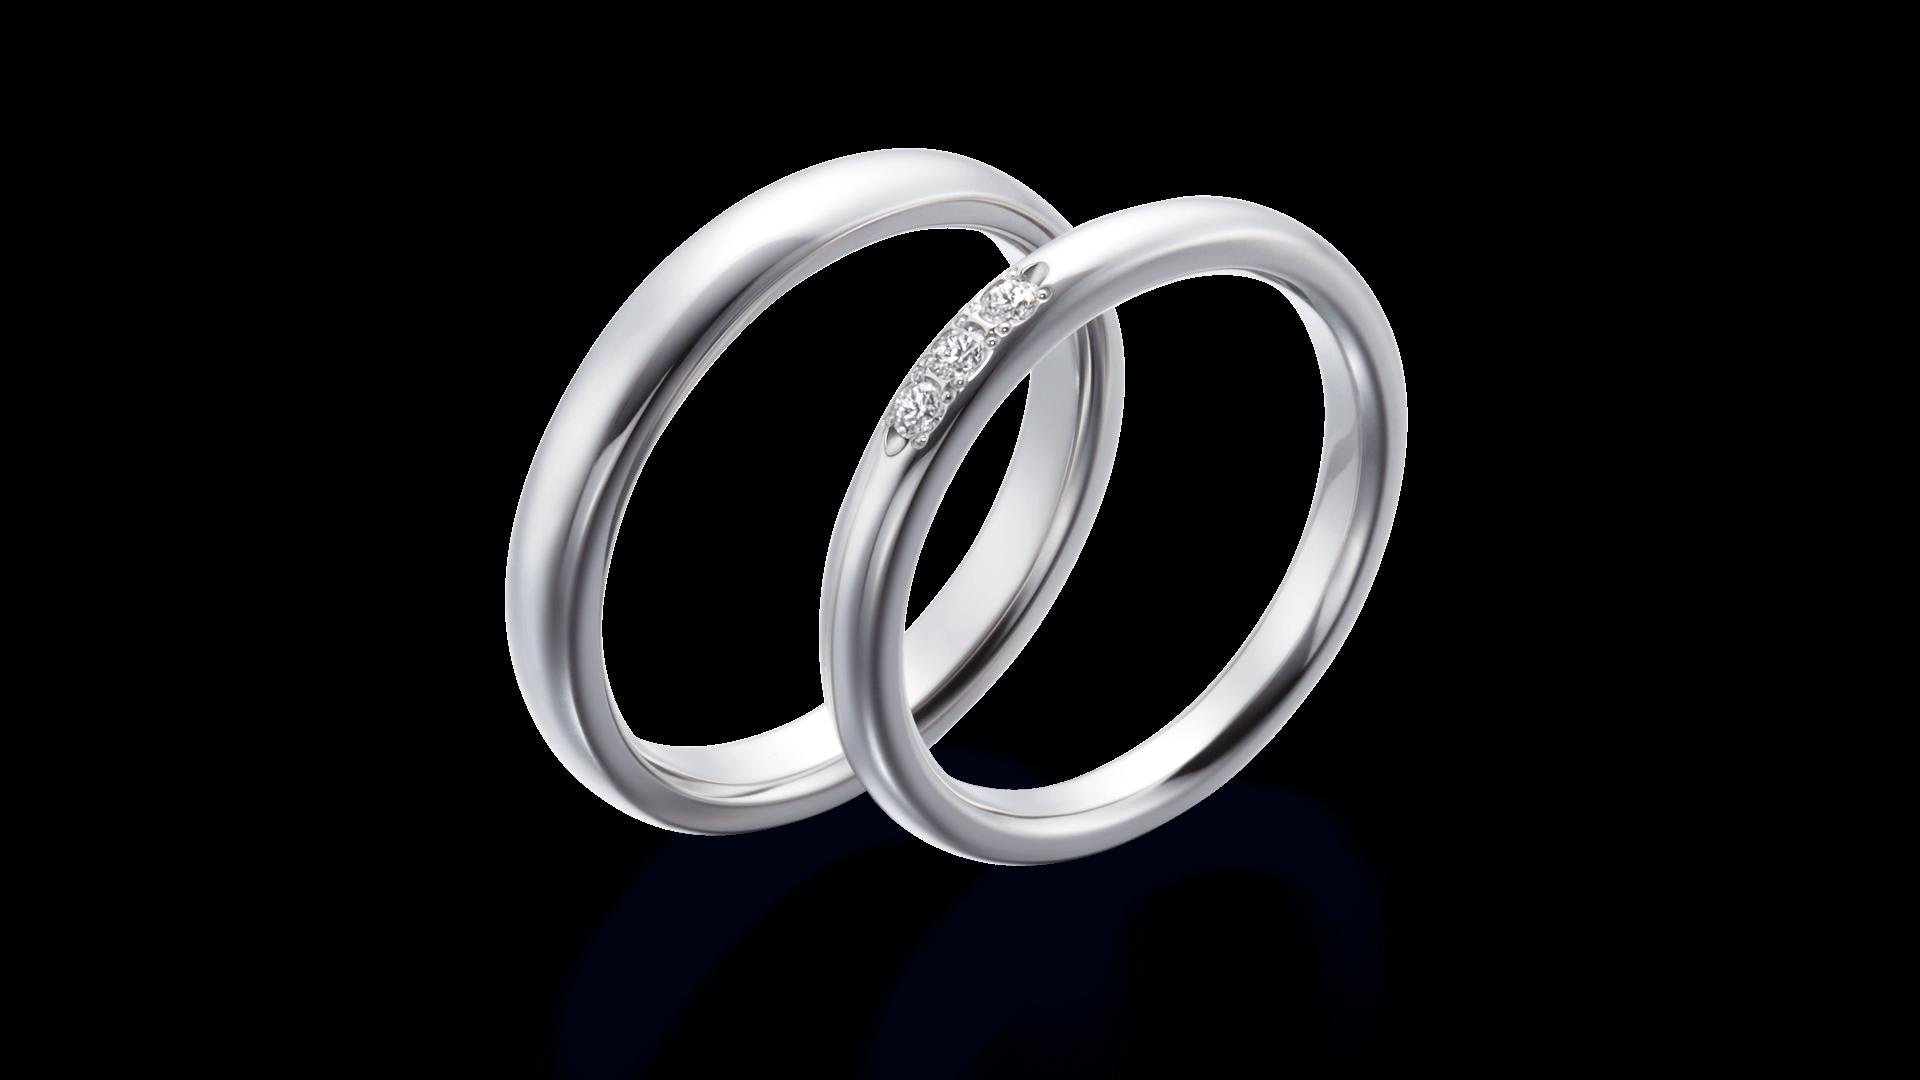 Origin Belief02 オリジンビリーフ02 | 結婚指輪サムネイル 2